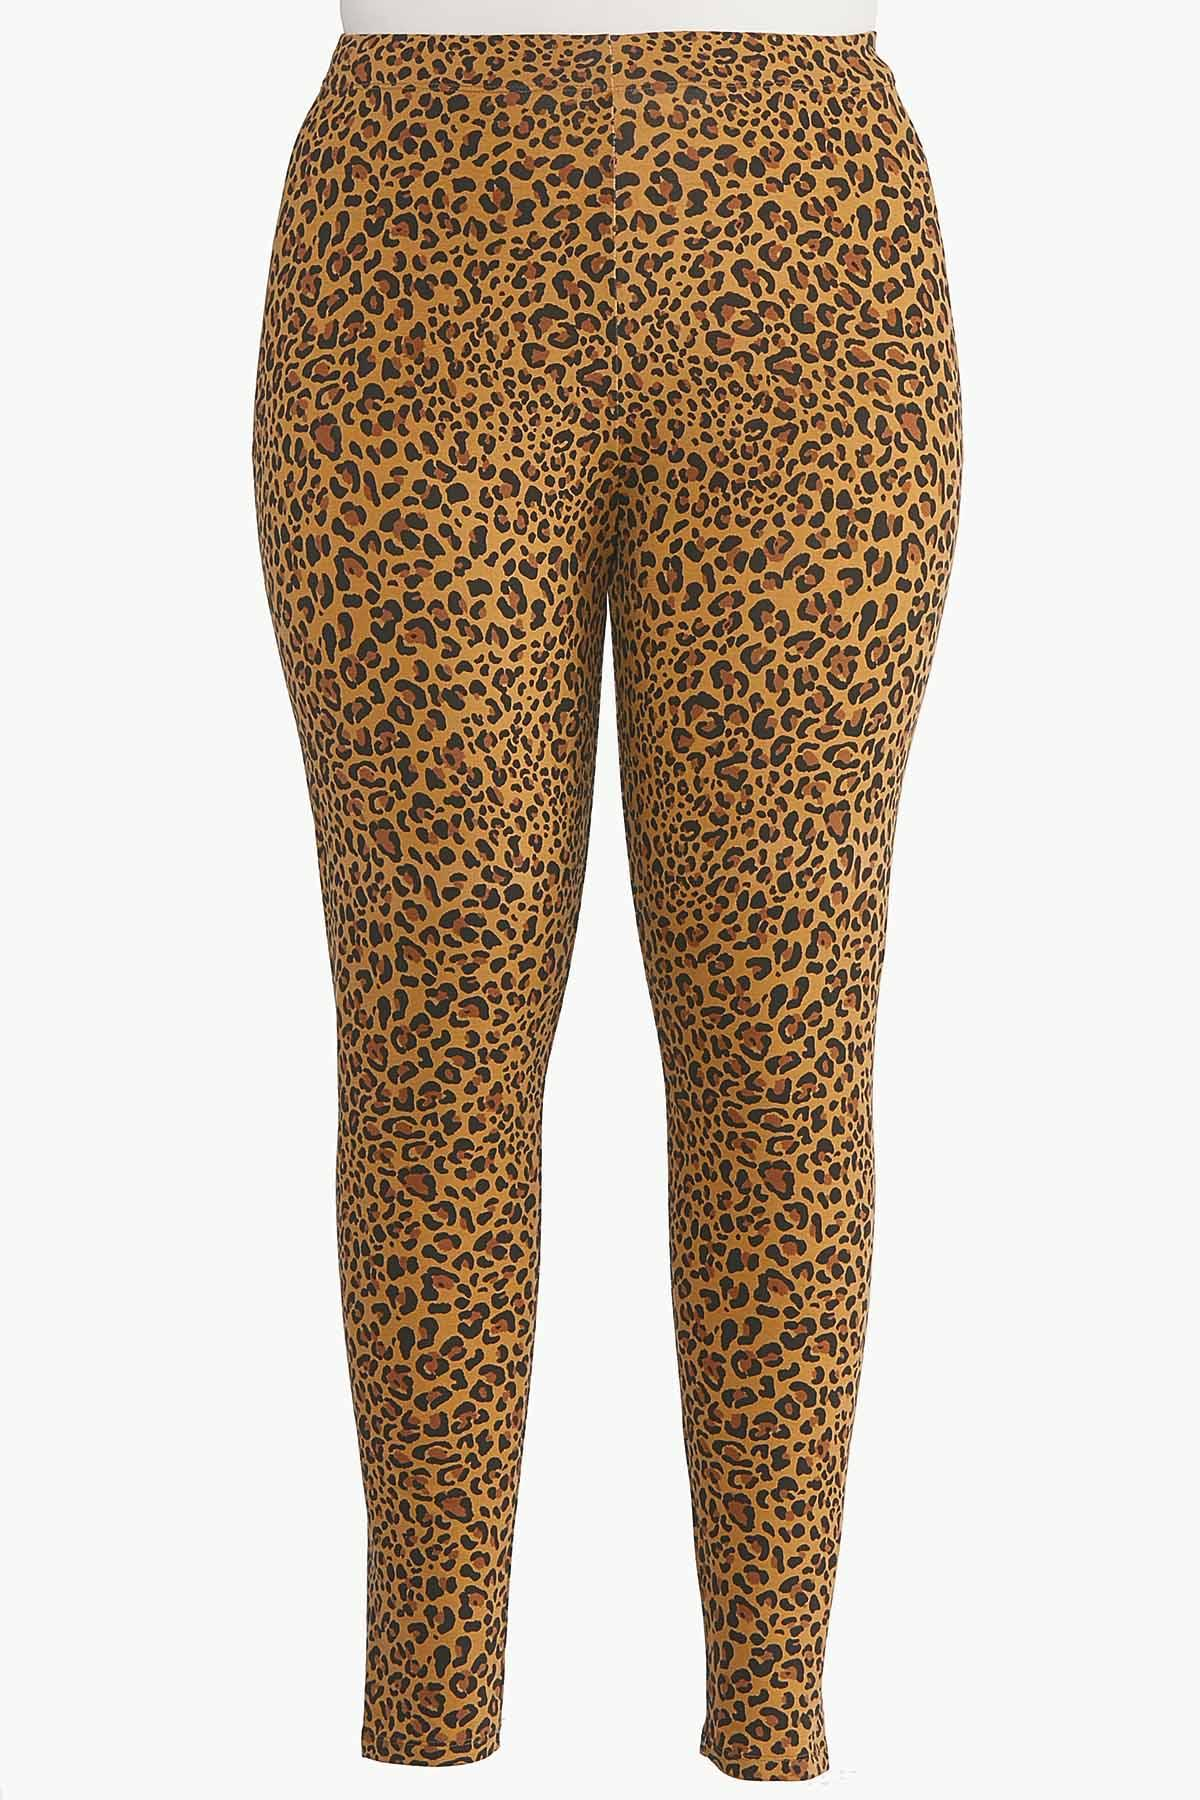 Plus Size Leopard Leggings